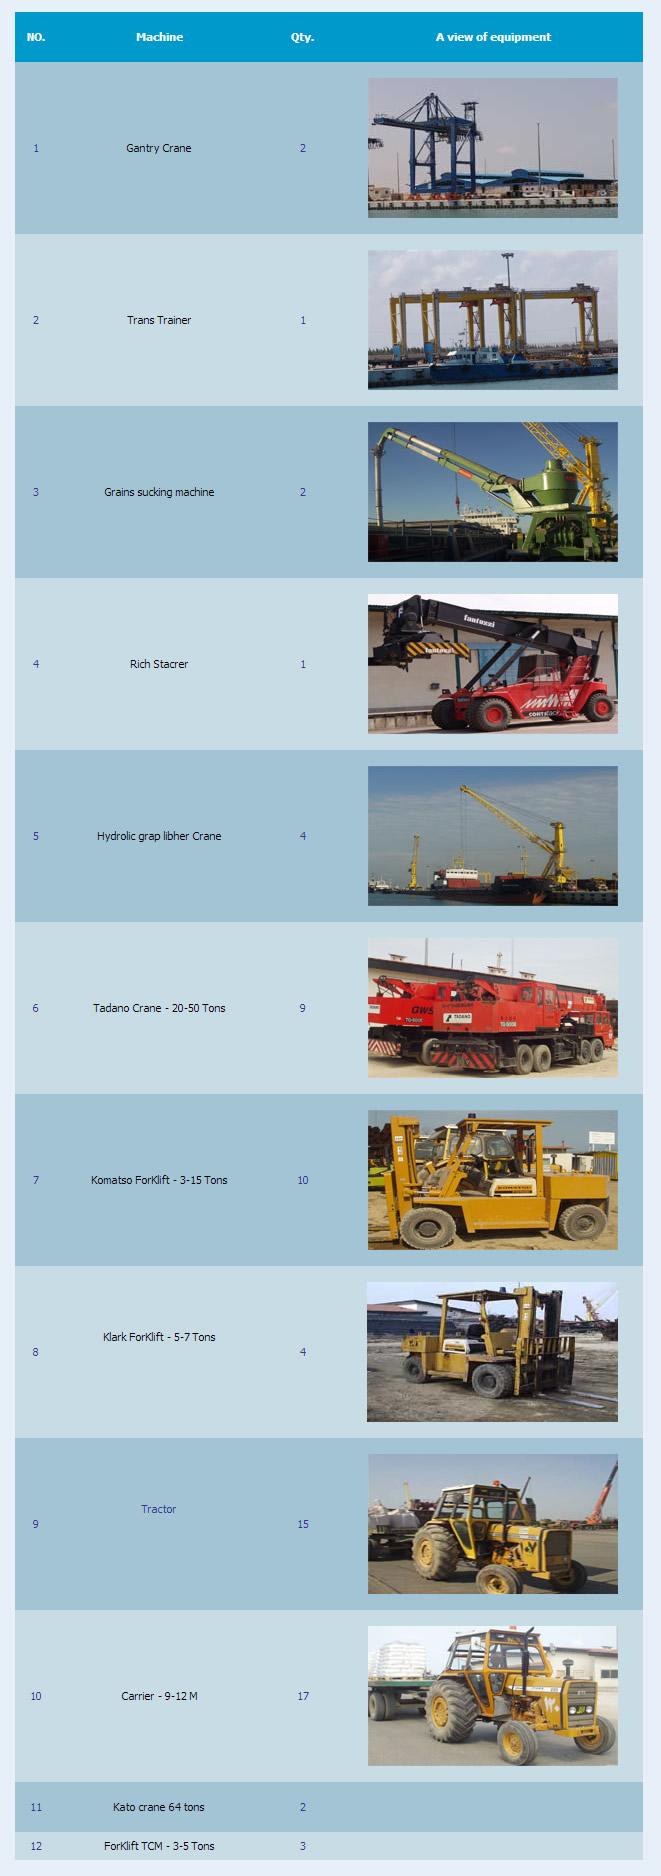 Amirabad Port Facilities Port and land equipment